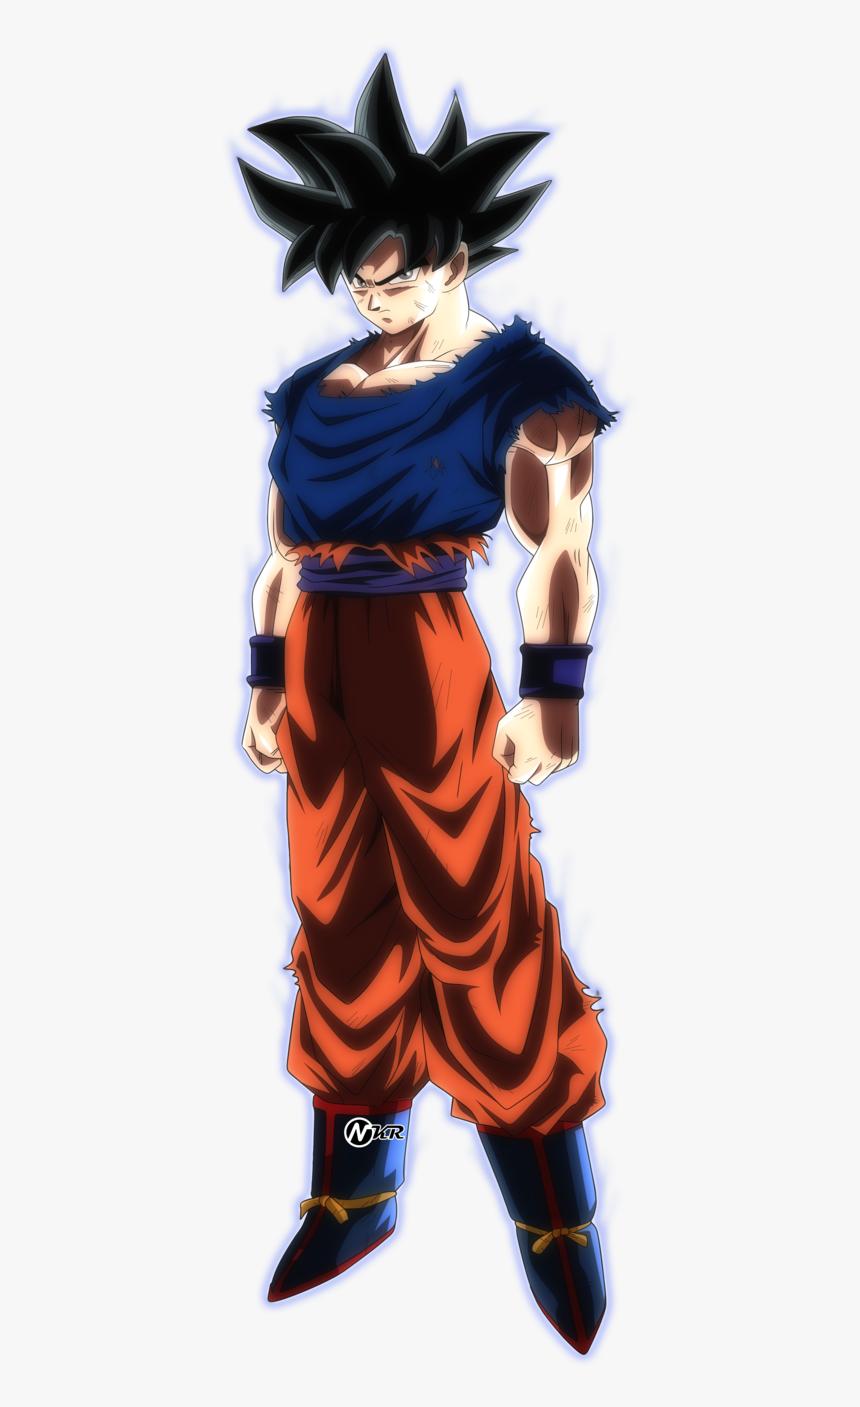 Goku Dbz Wallpaper Iphone Hd Png Download Transparent Png Image Pngitem